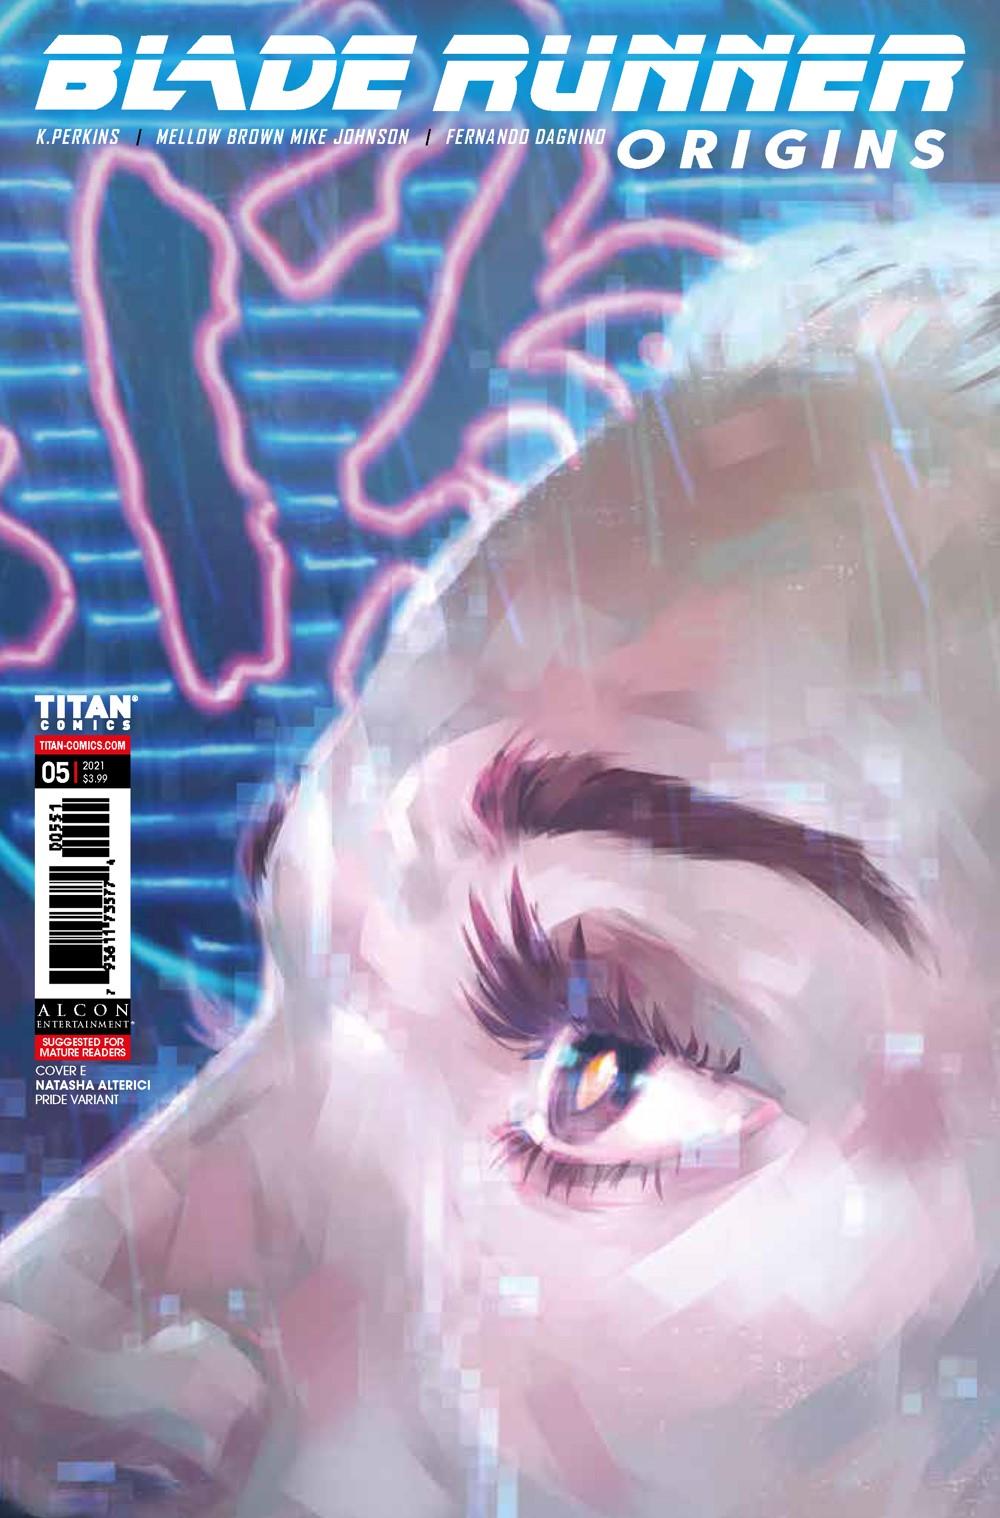 Blade_Runner_Origins_5_COVERS_E ComicList Previews: BLADE RUNNER ORIGINS #5